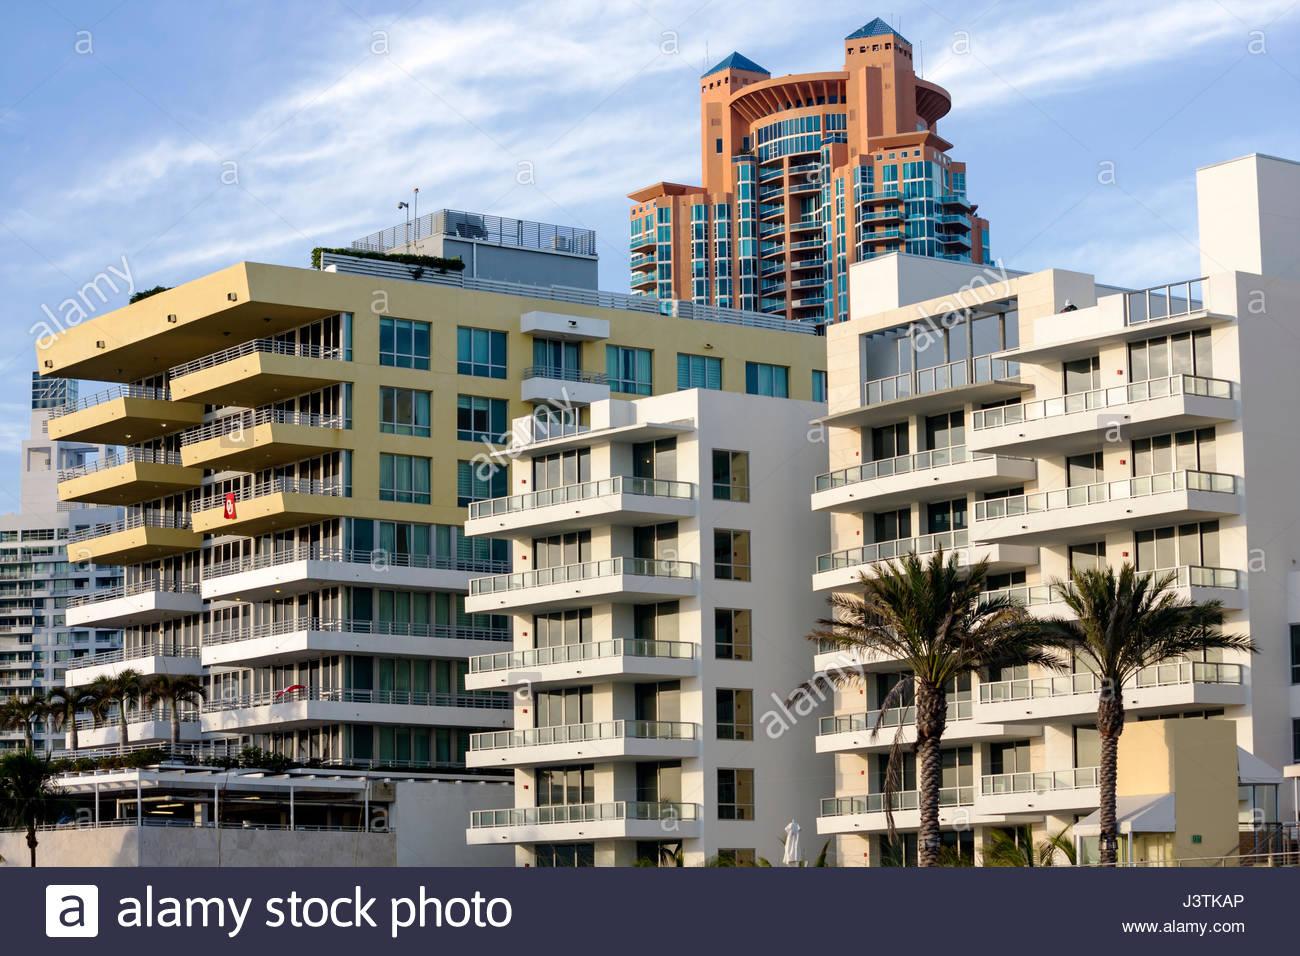 miami beach florida south beach south pointe condominium building